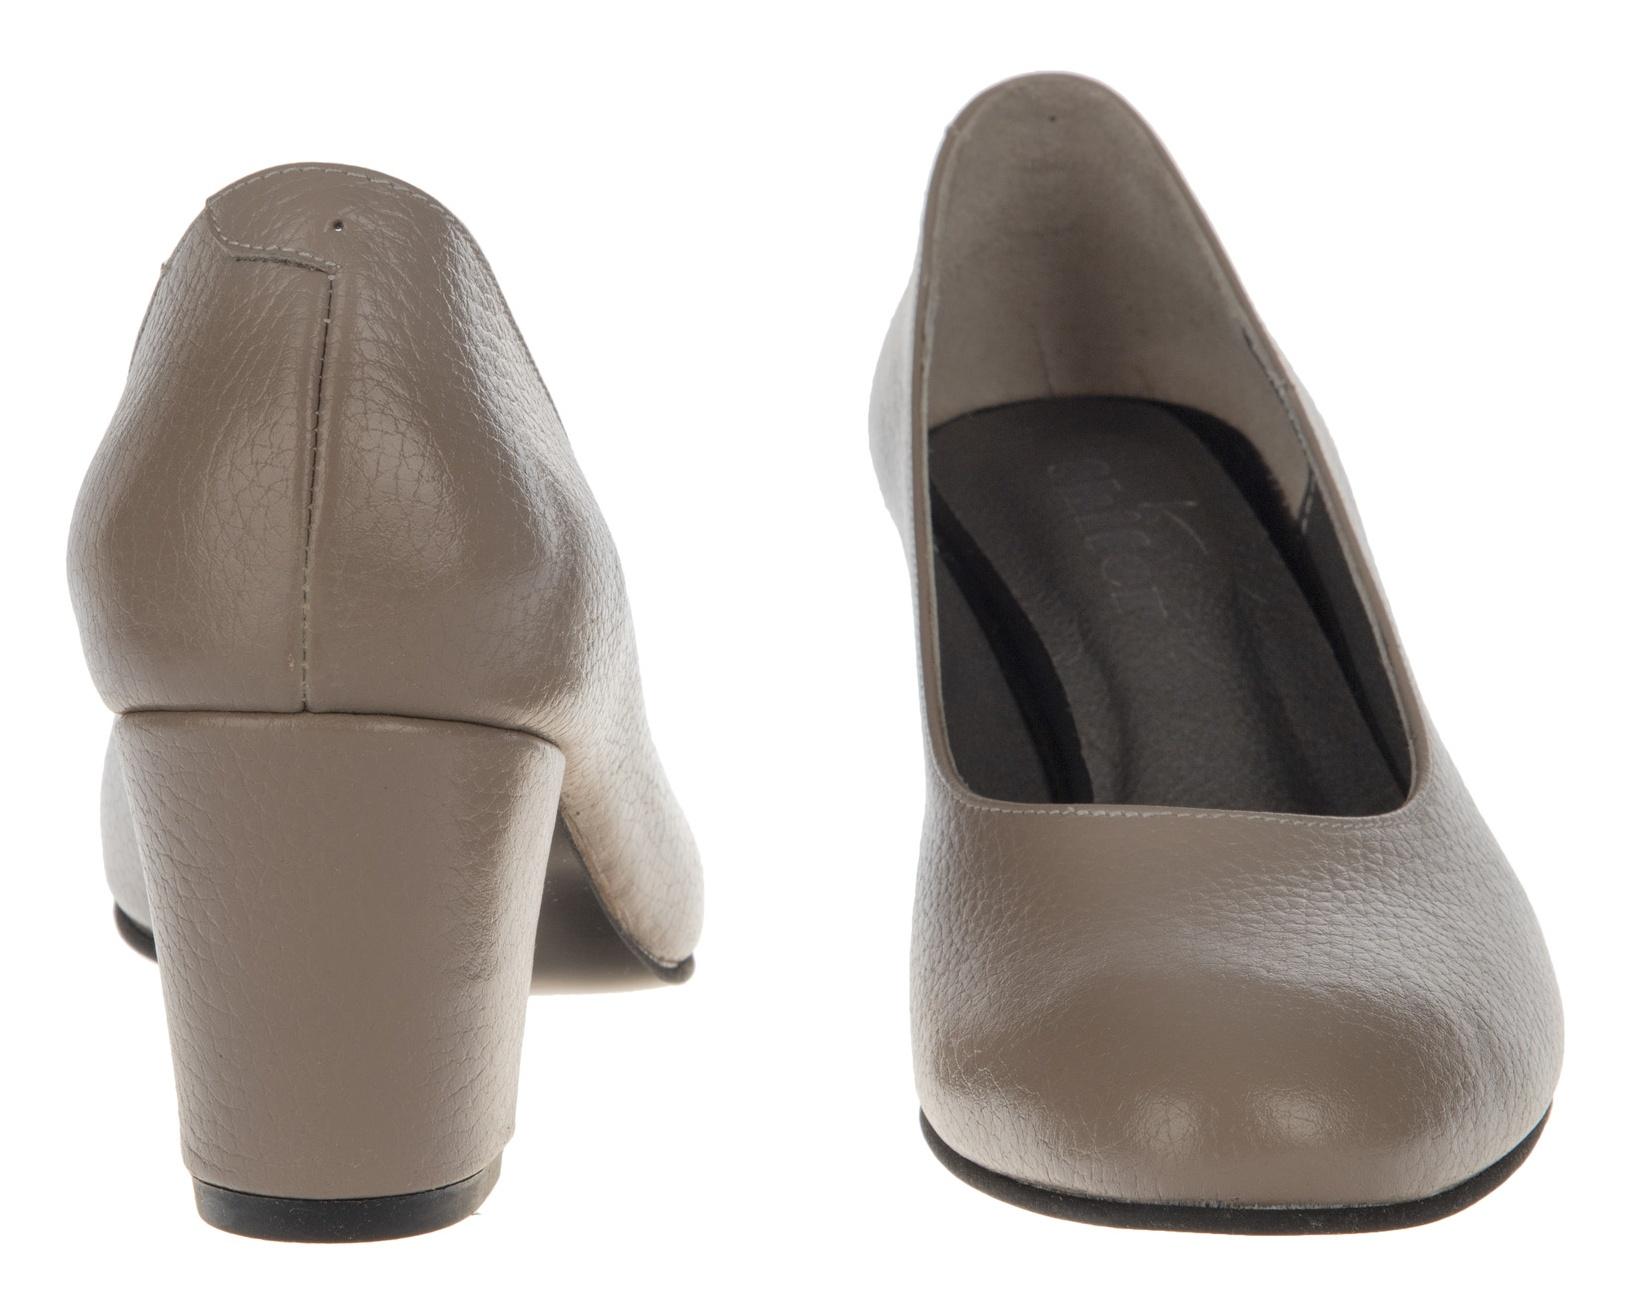 کفش نه شیفر مدل 5245A-106